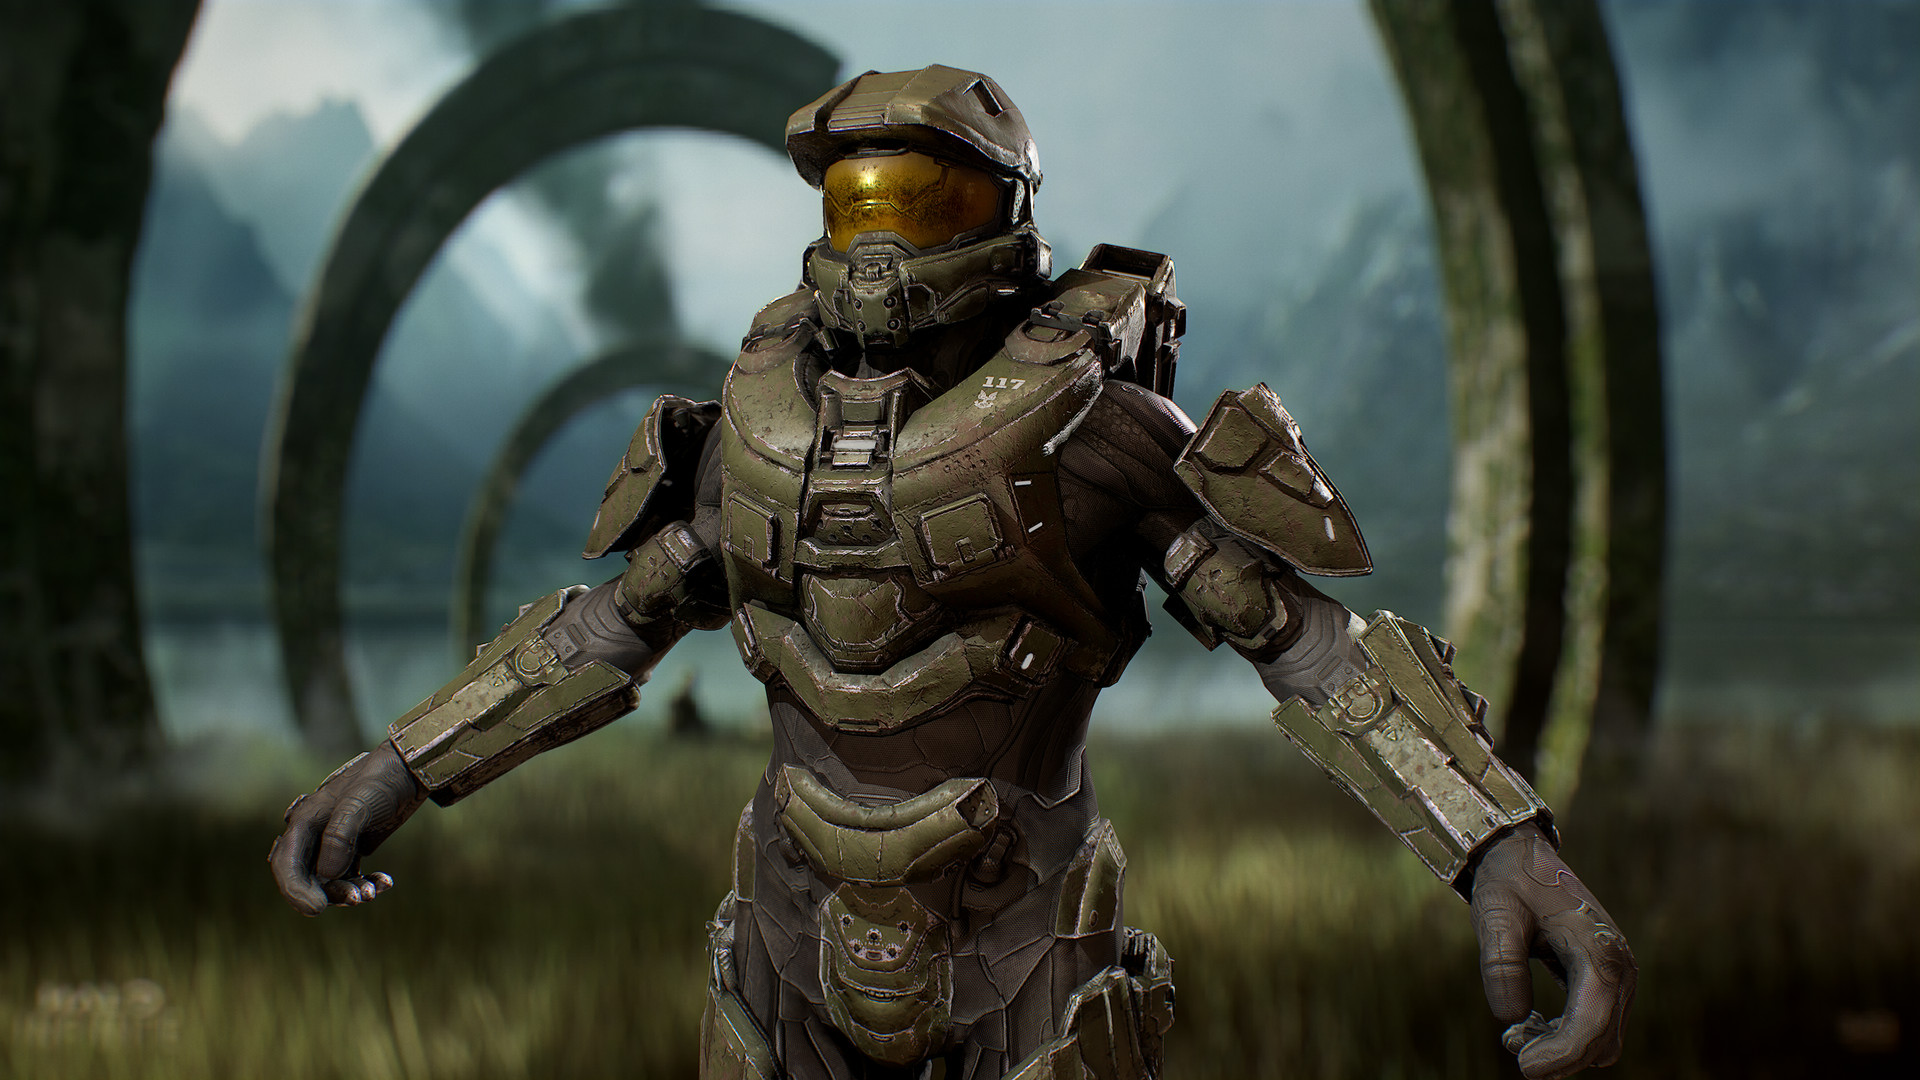 Artstation Halo 5 Mjolnir Armor Battle Dirty Dorian Pillari